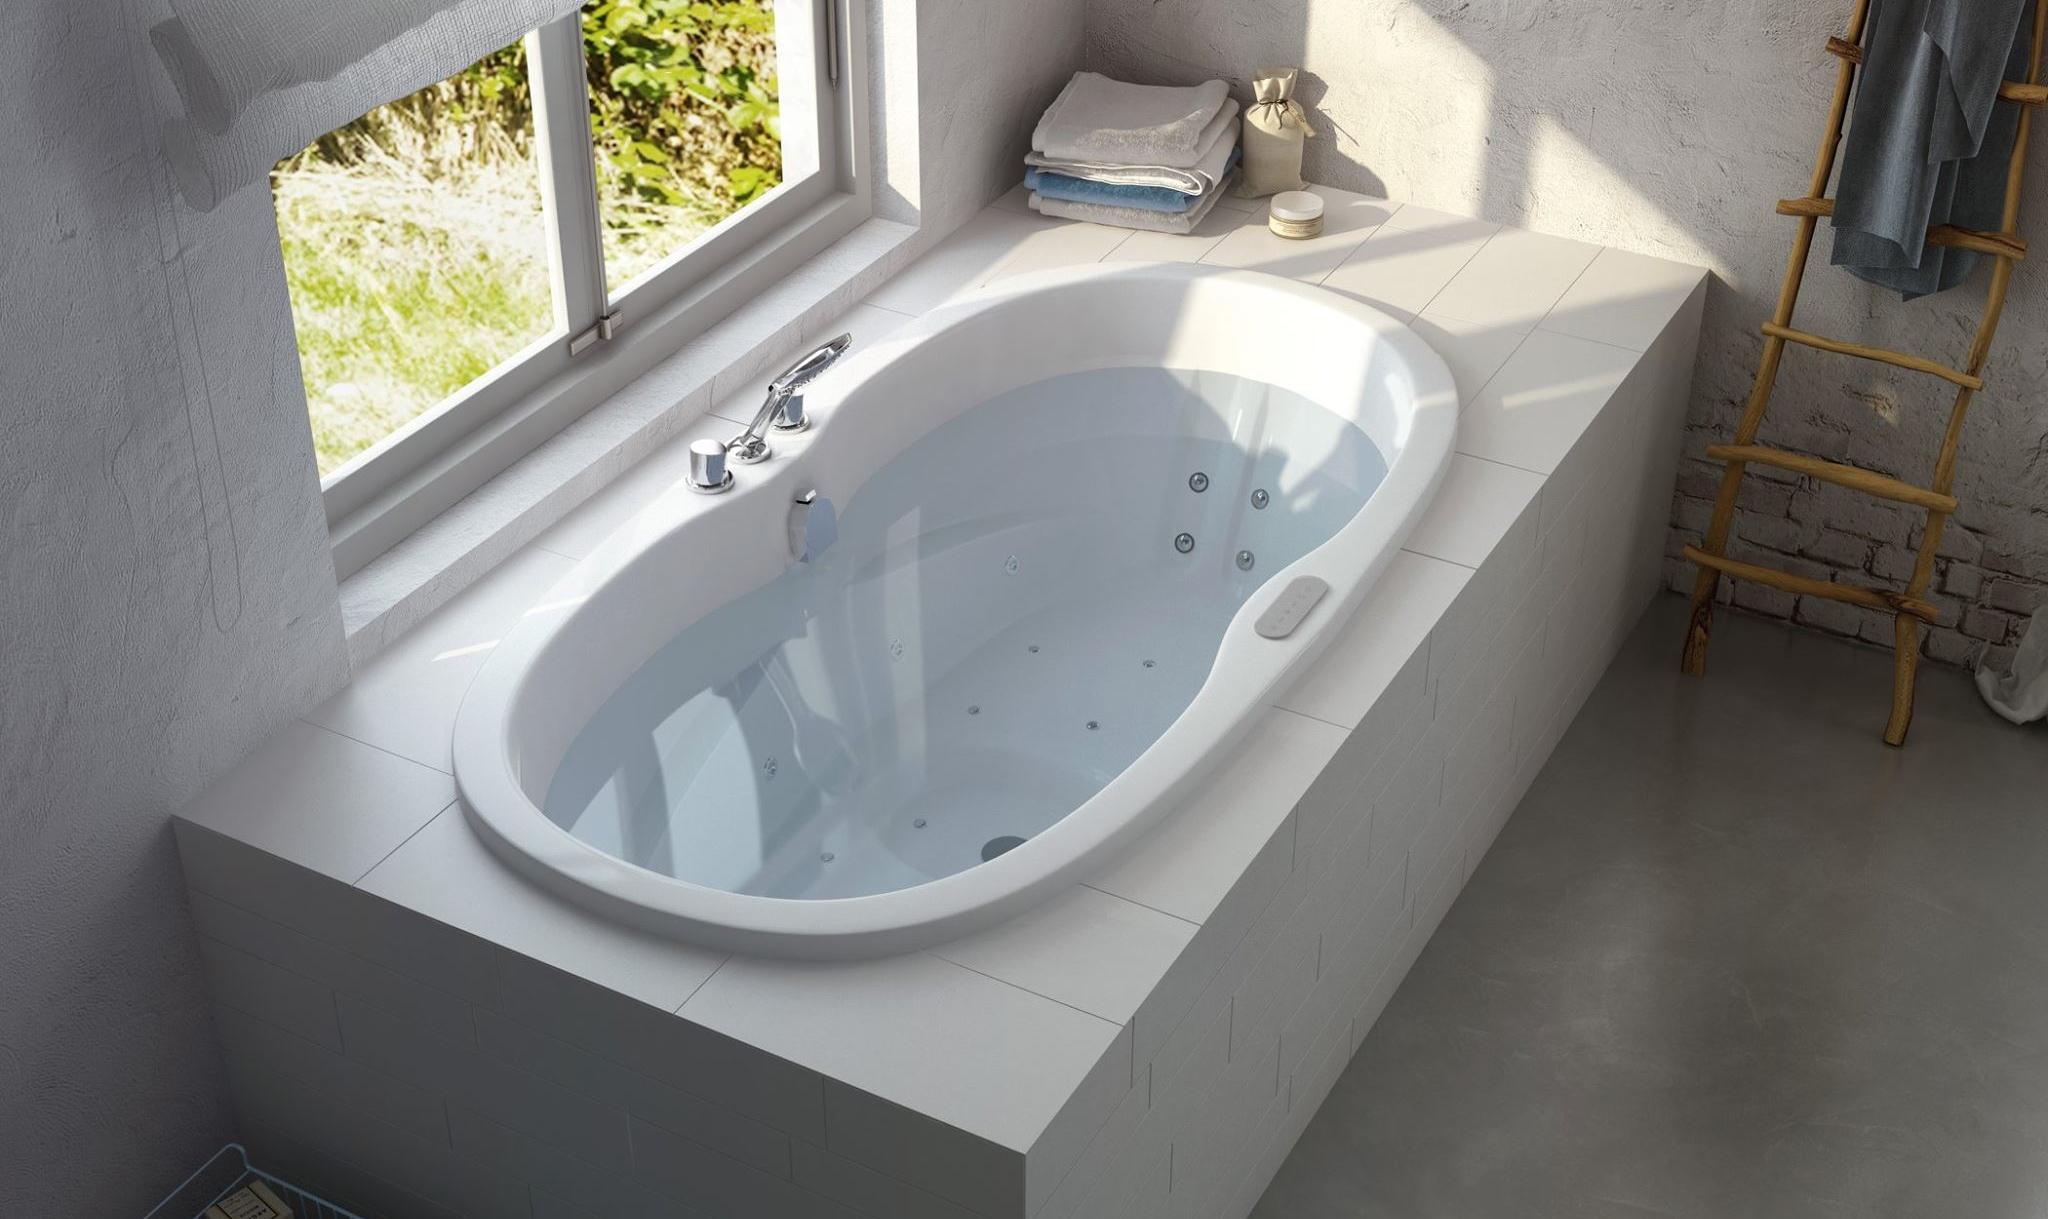 Whirlpool Startpagina voor badkamer ideeën | UW-badkamer.nl